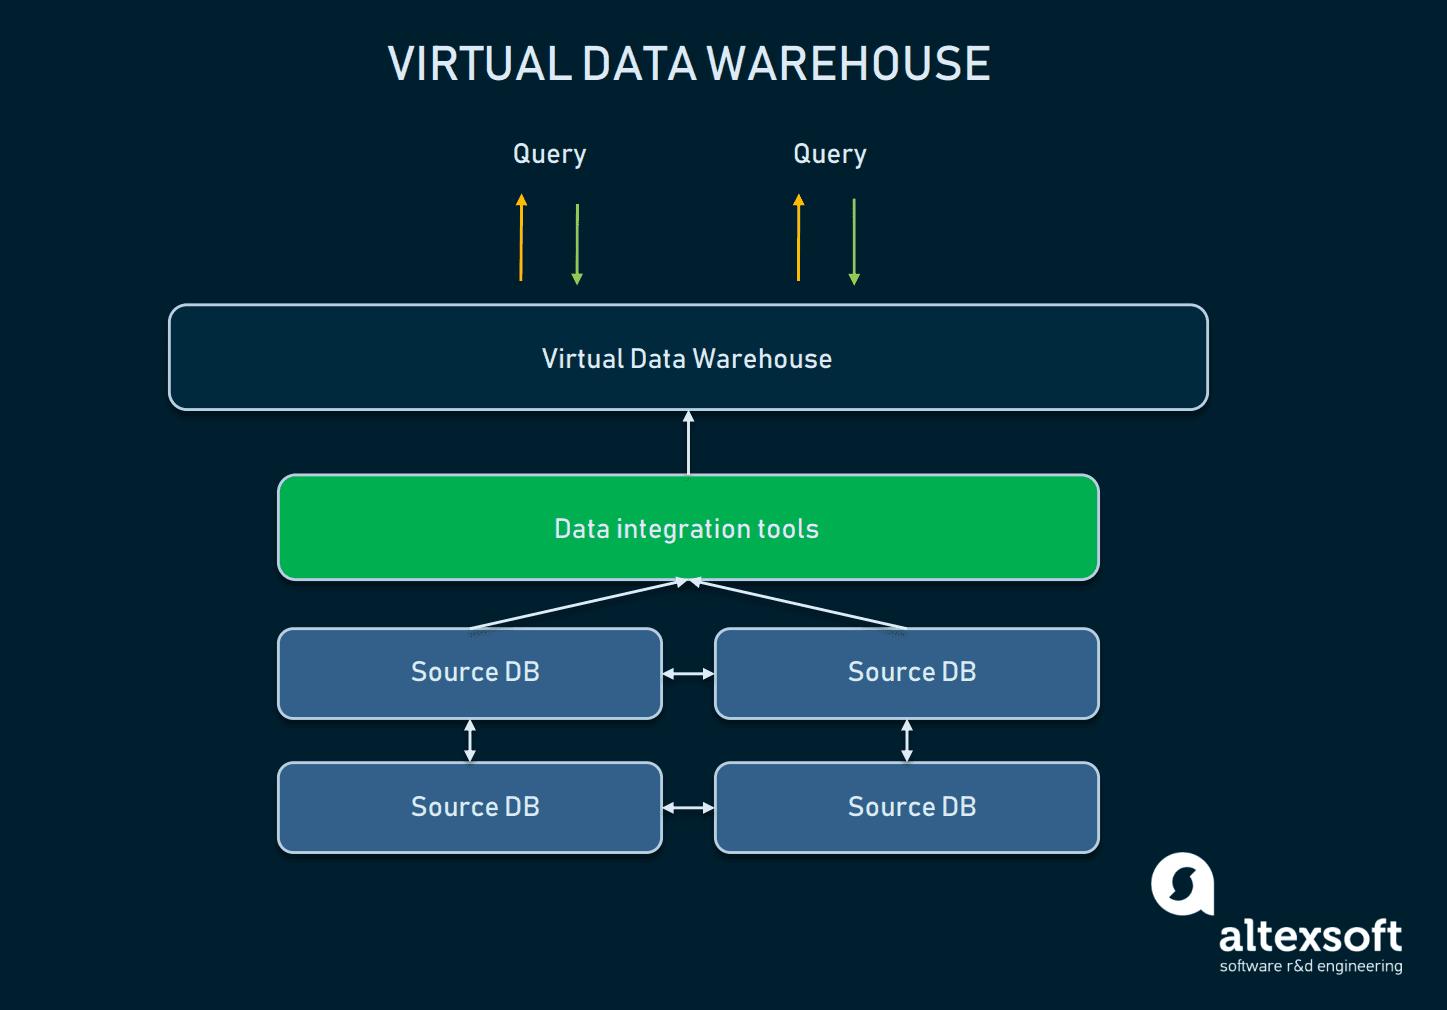 Virtual Data Warehouse architecture